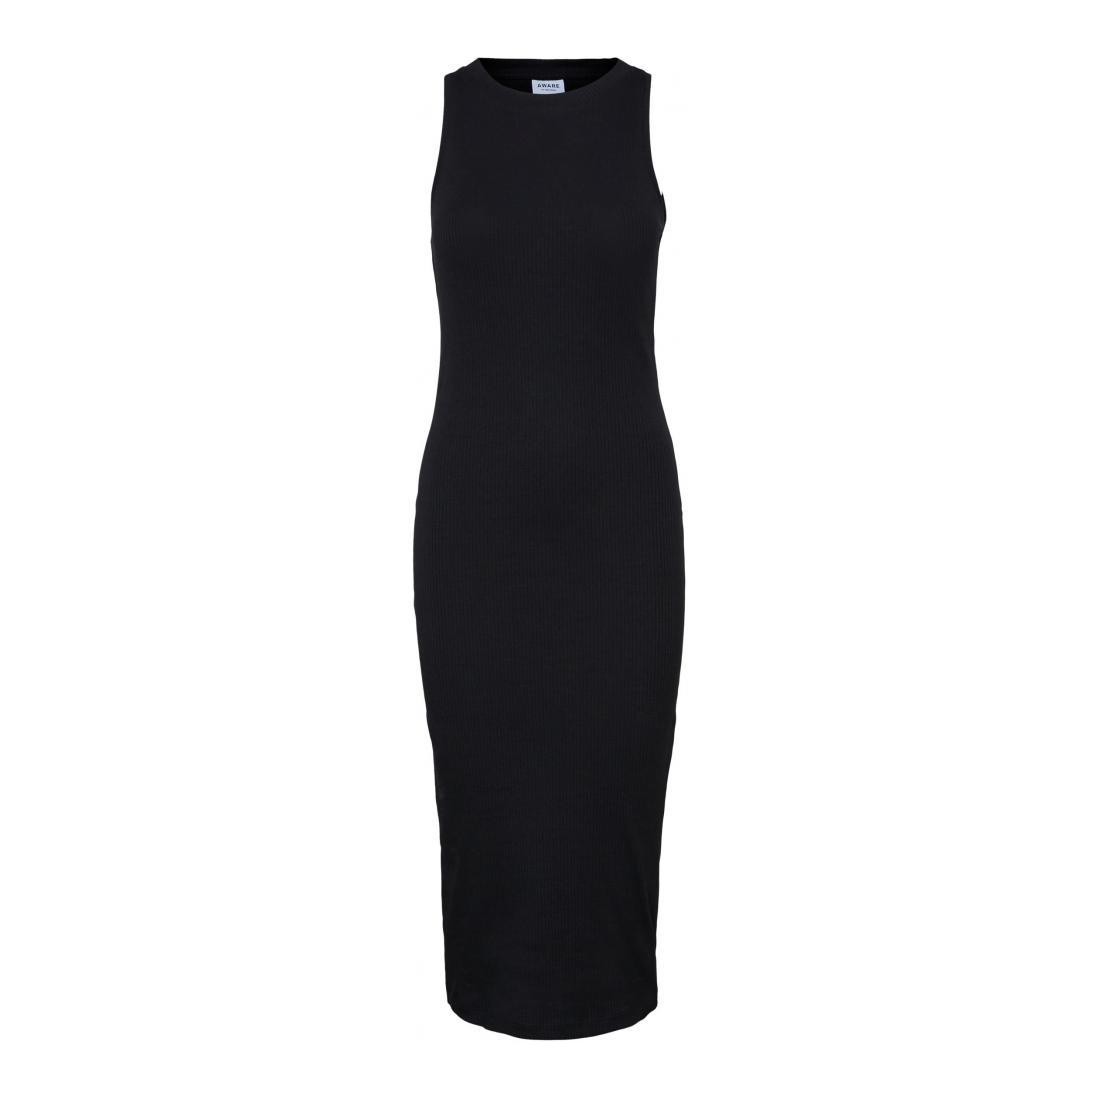 Vero Moda Kleider lang Damen VMLAVENDER SL CALF DRESS